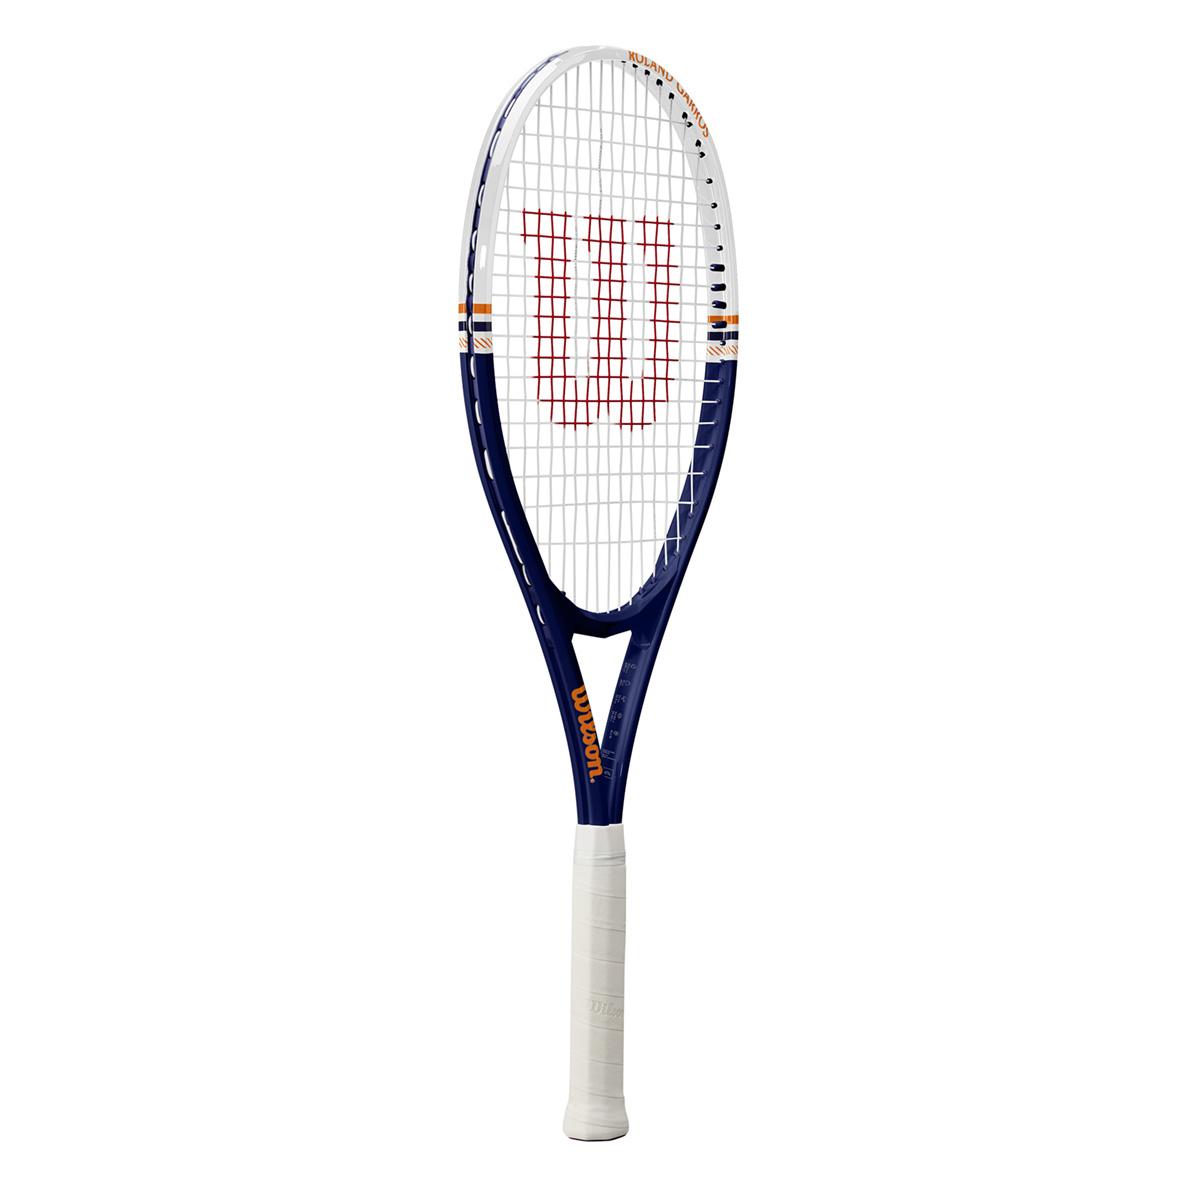 WR070410U_1_Roland_Garros_Elite_Adult_WH_NA.png.cq5dam.web.2000.2000